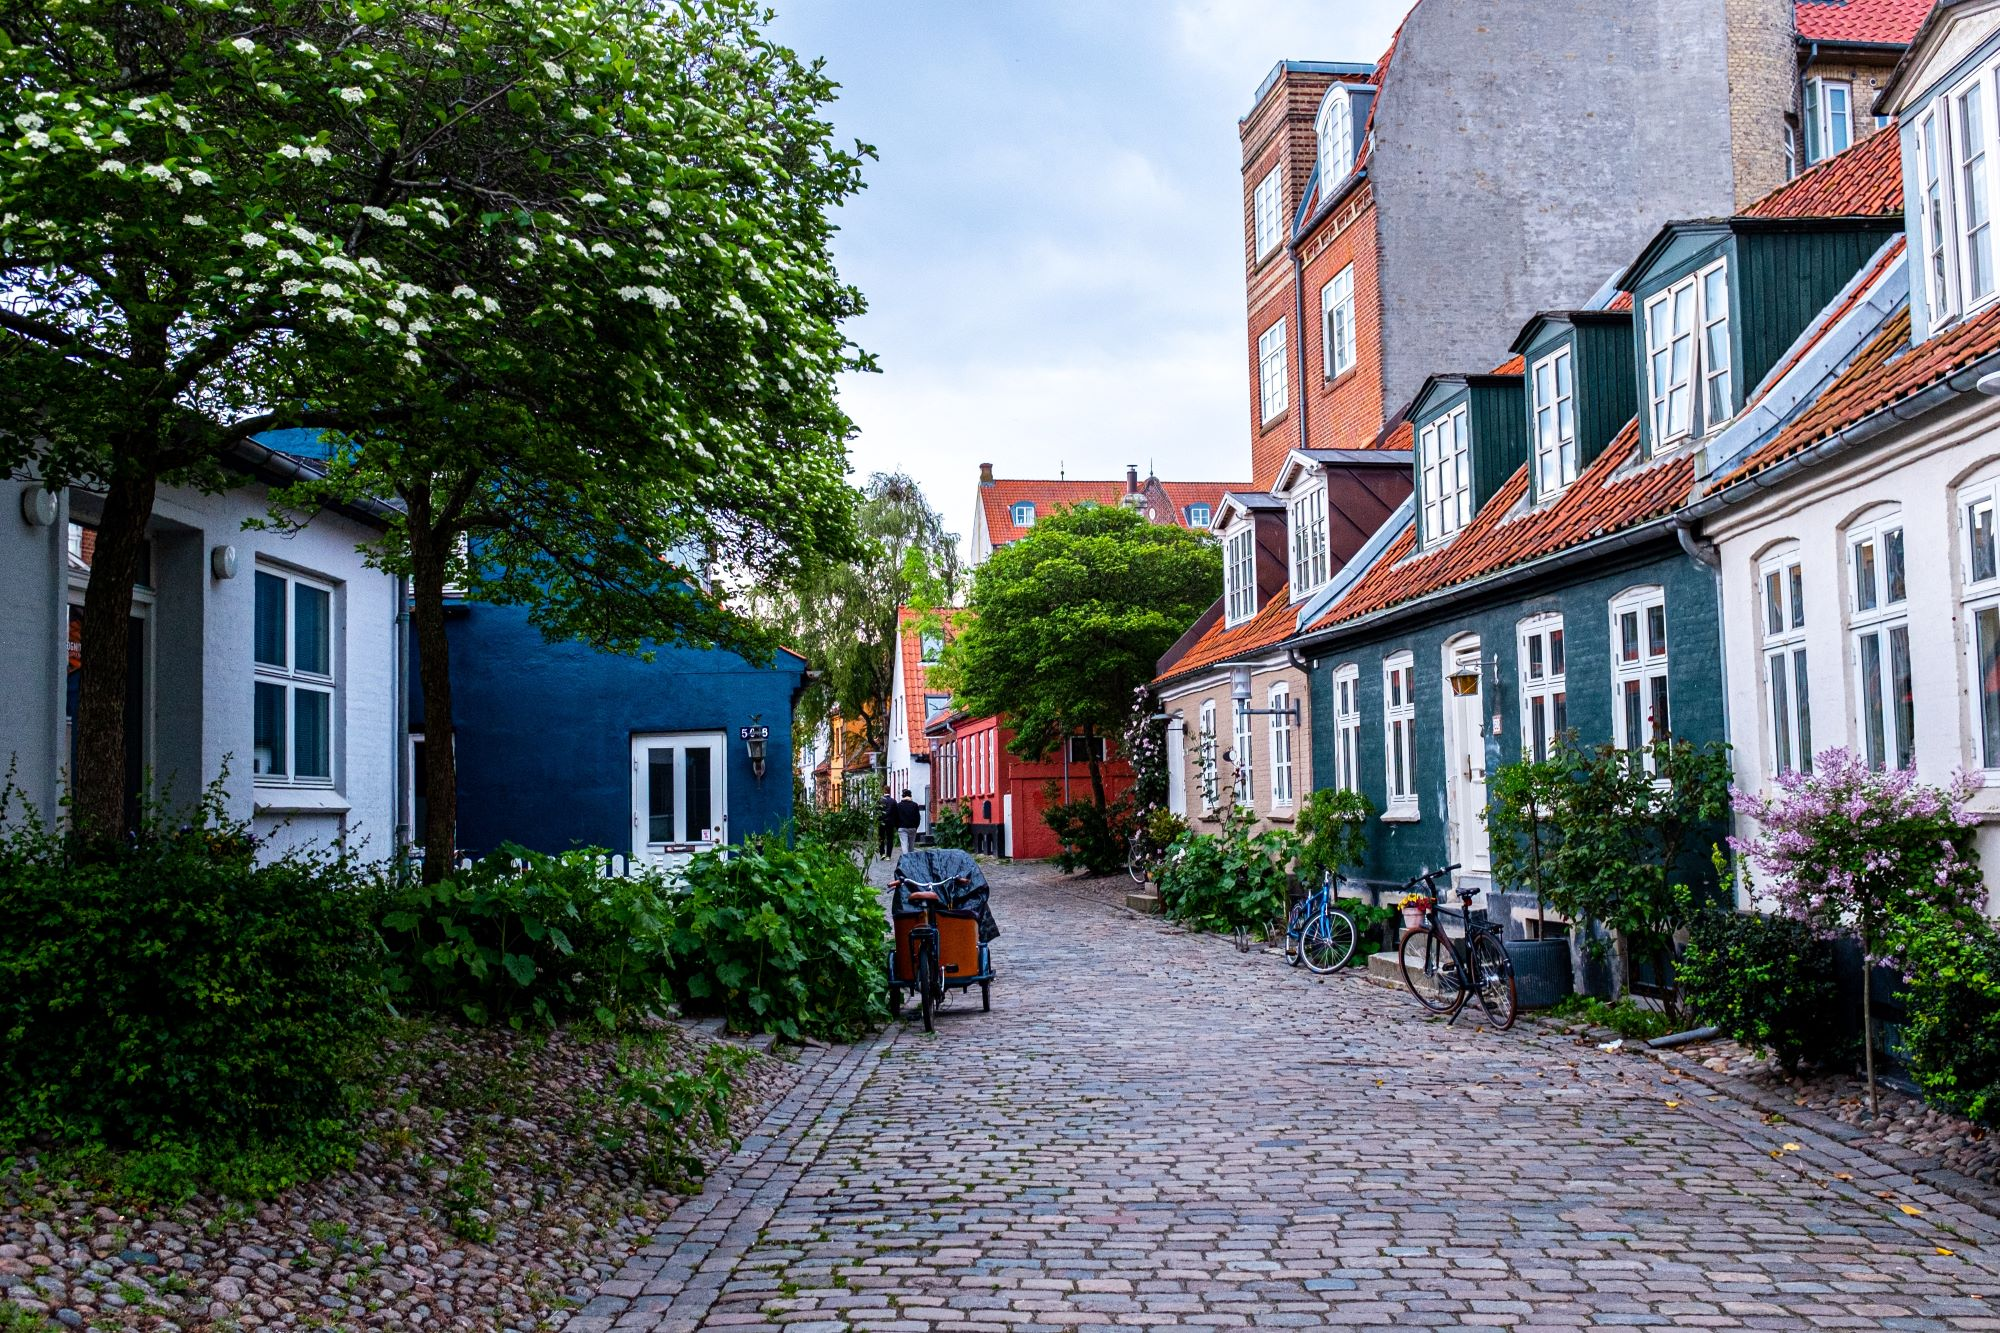 La rue Møllestien à Aarhus par Steffen Muldbjerg